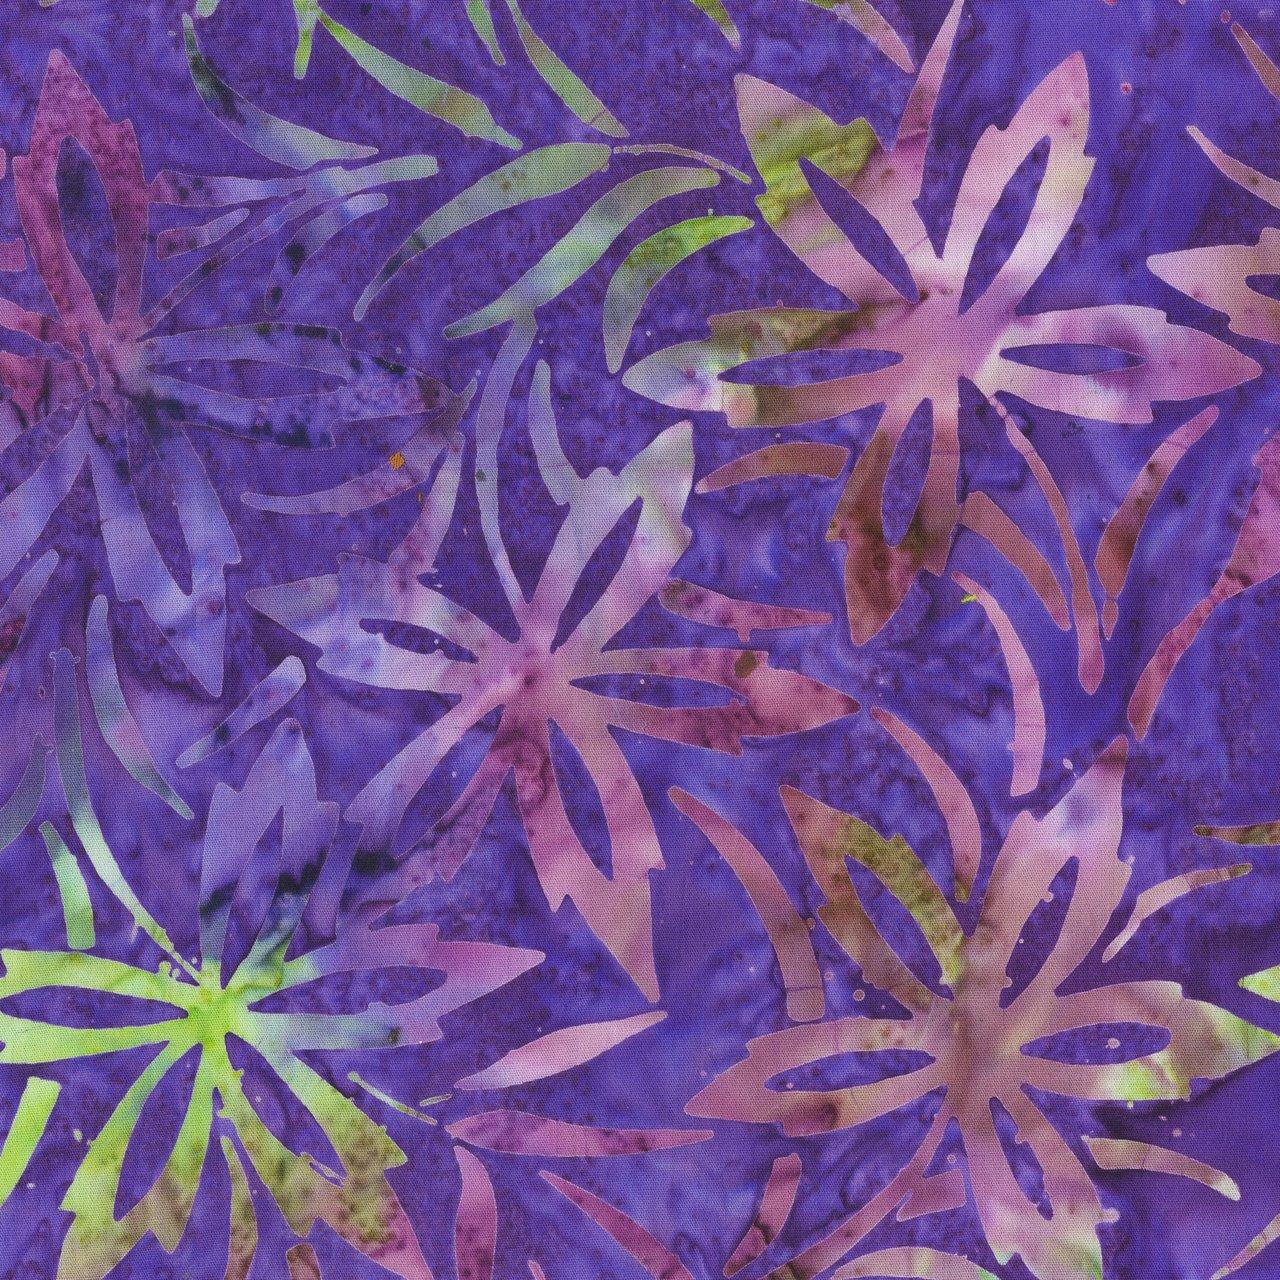 2018Q-6 Art Inspired: Northern Blooms by Erin Hanson